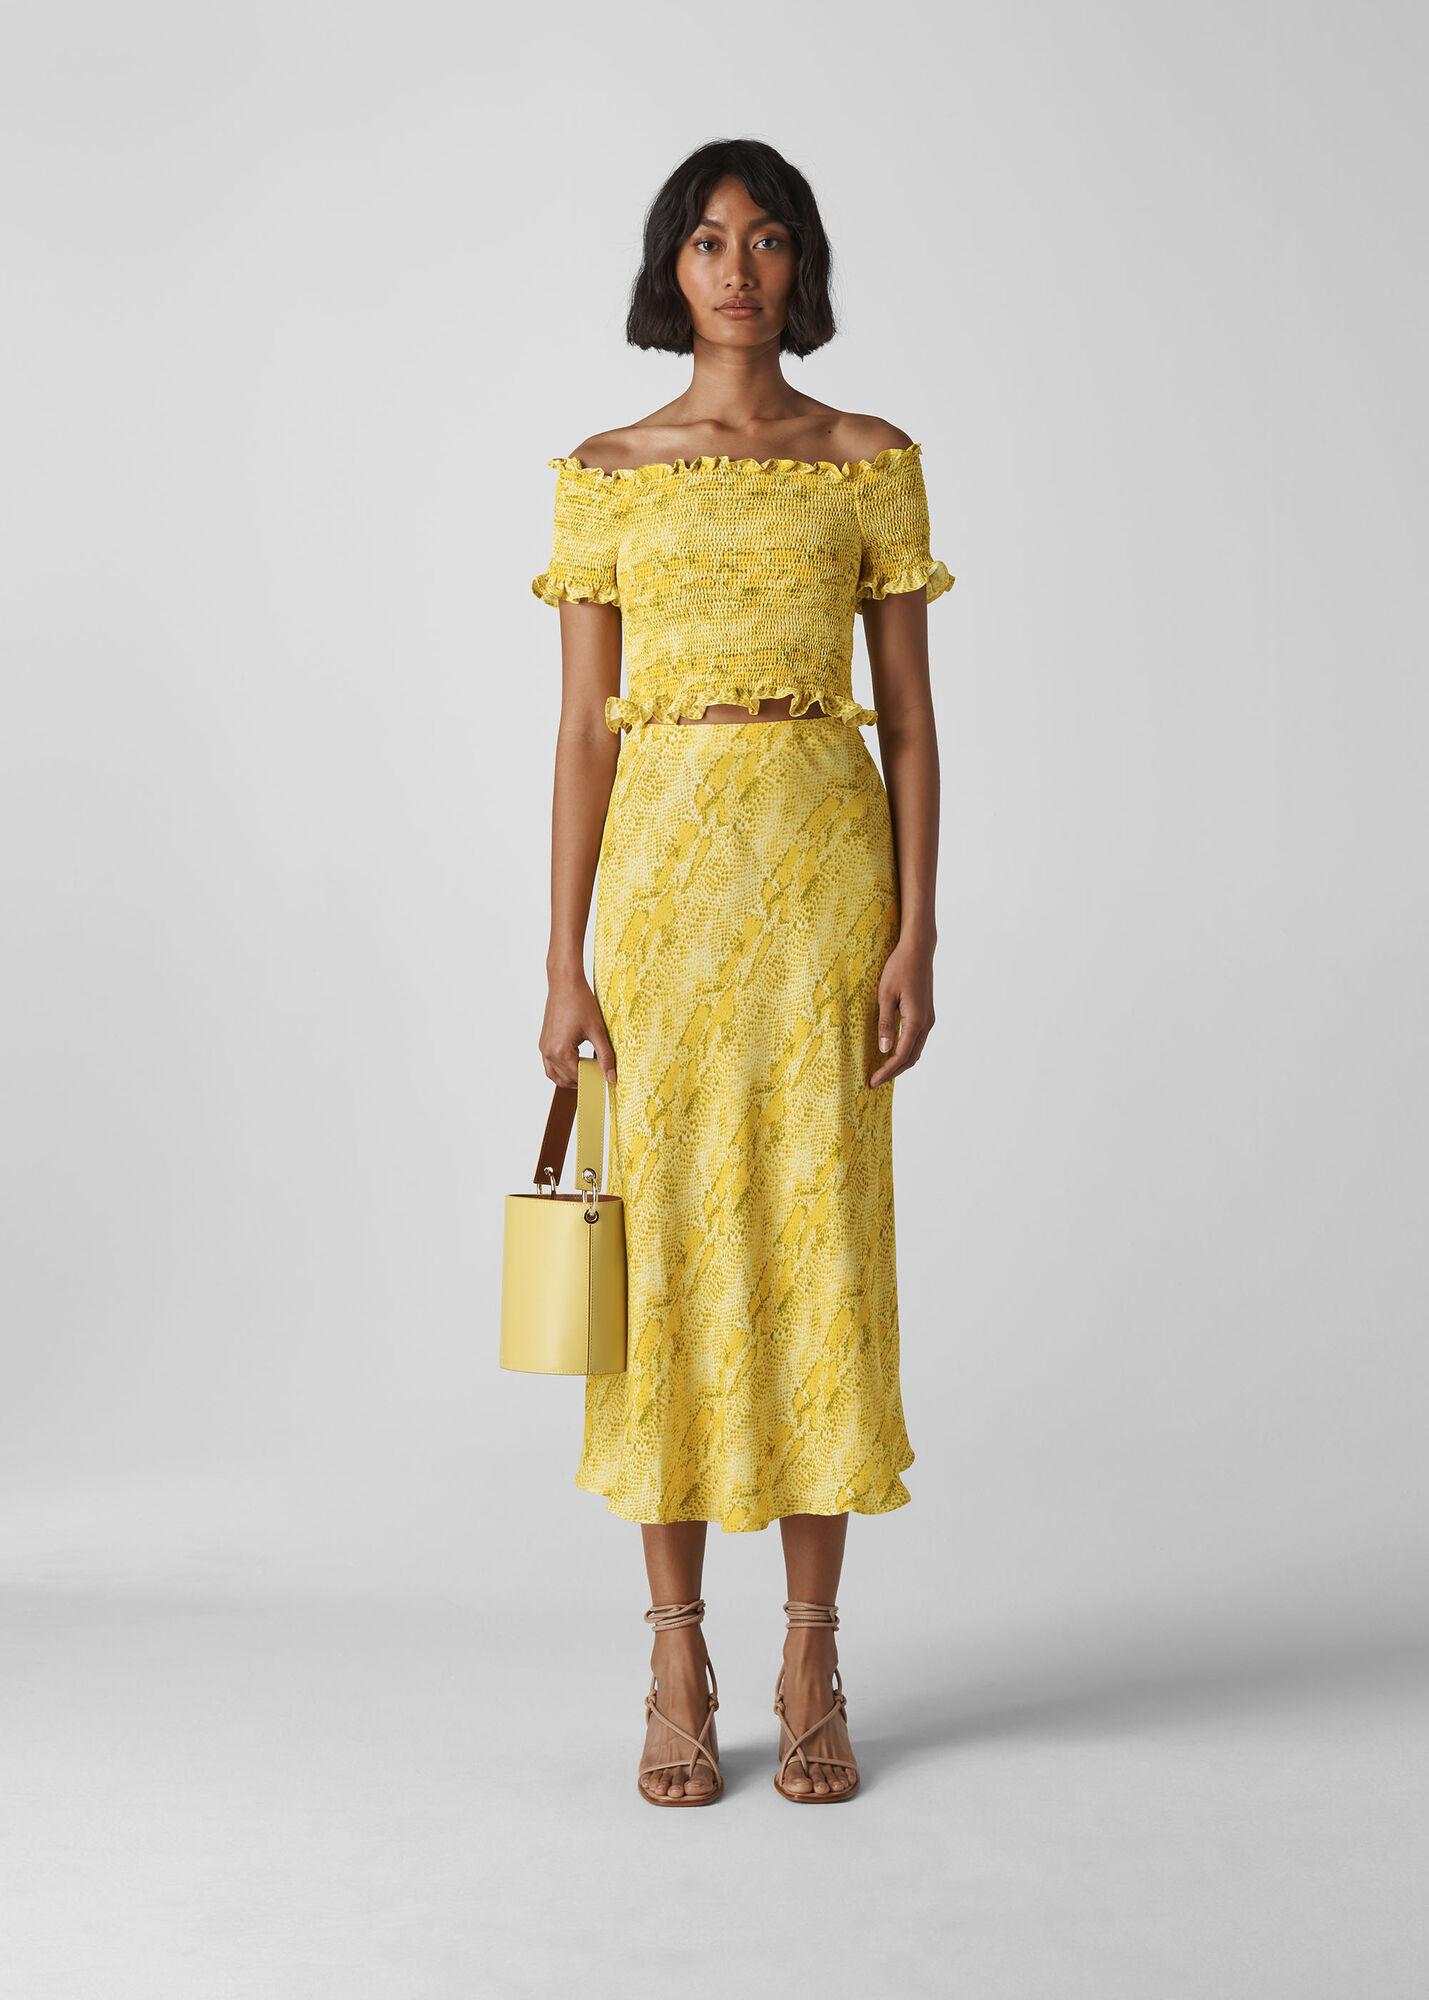 Python Print Bias Cut Skirt